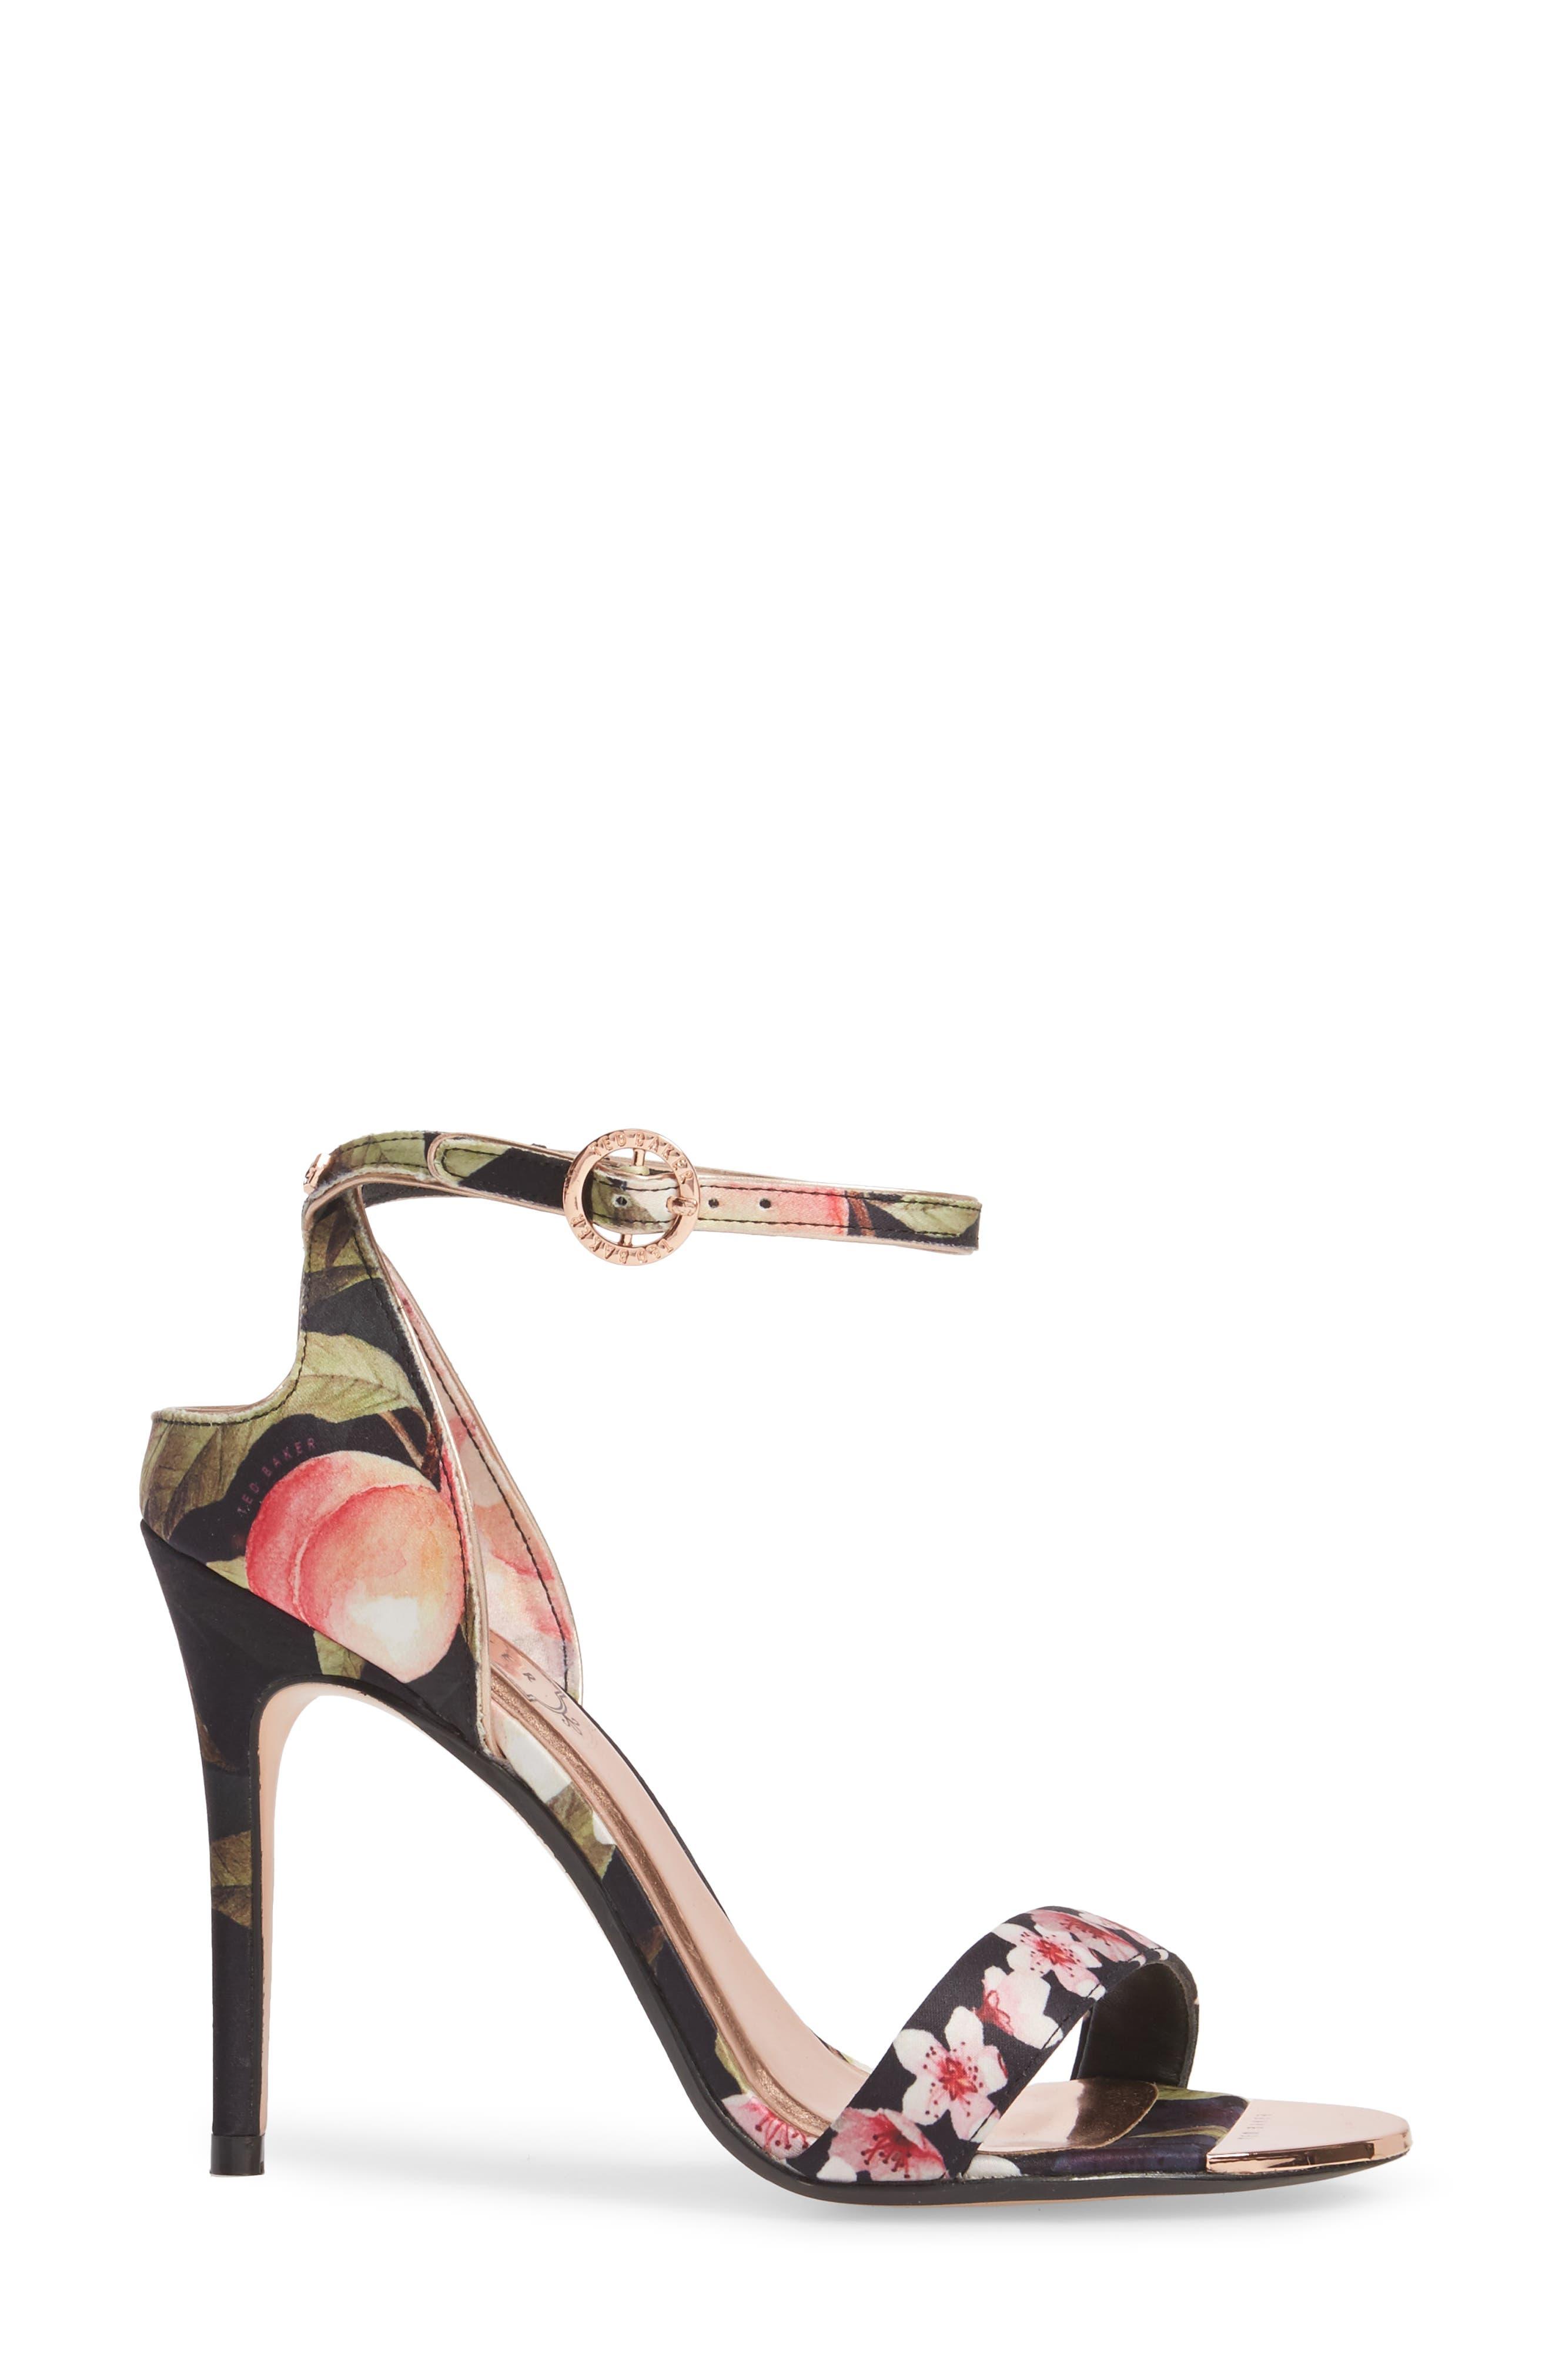 Mirobep Sandal,                             Alternate thumbnail 3, color,                             Peach Blossom Black Satin